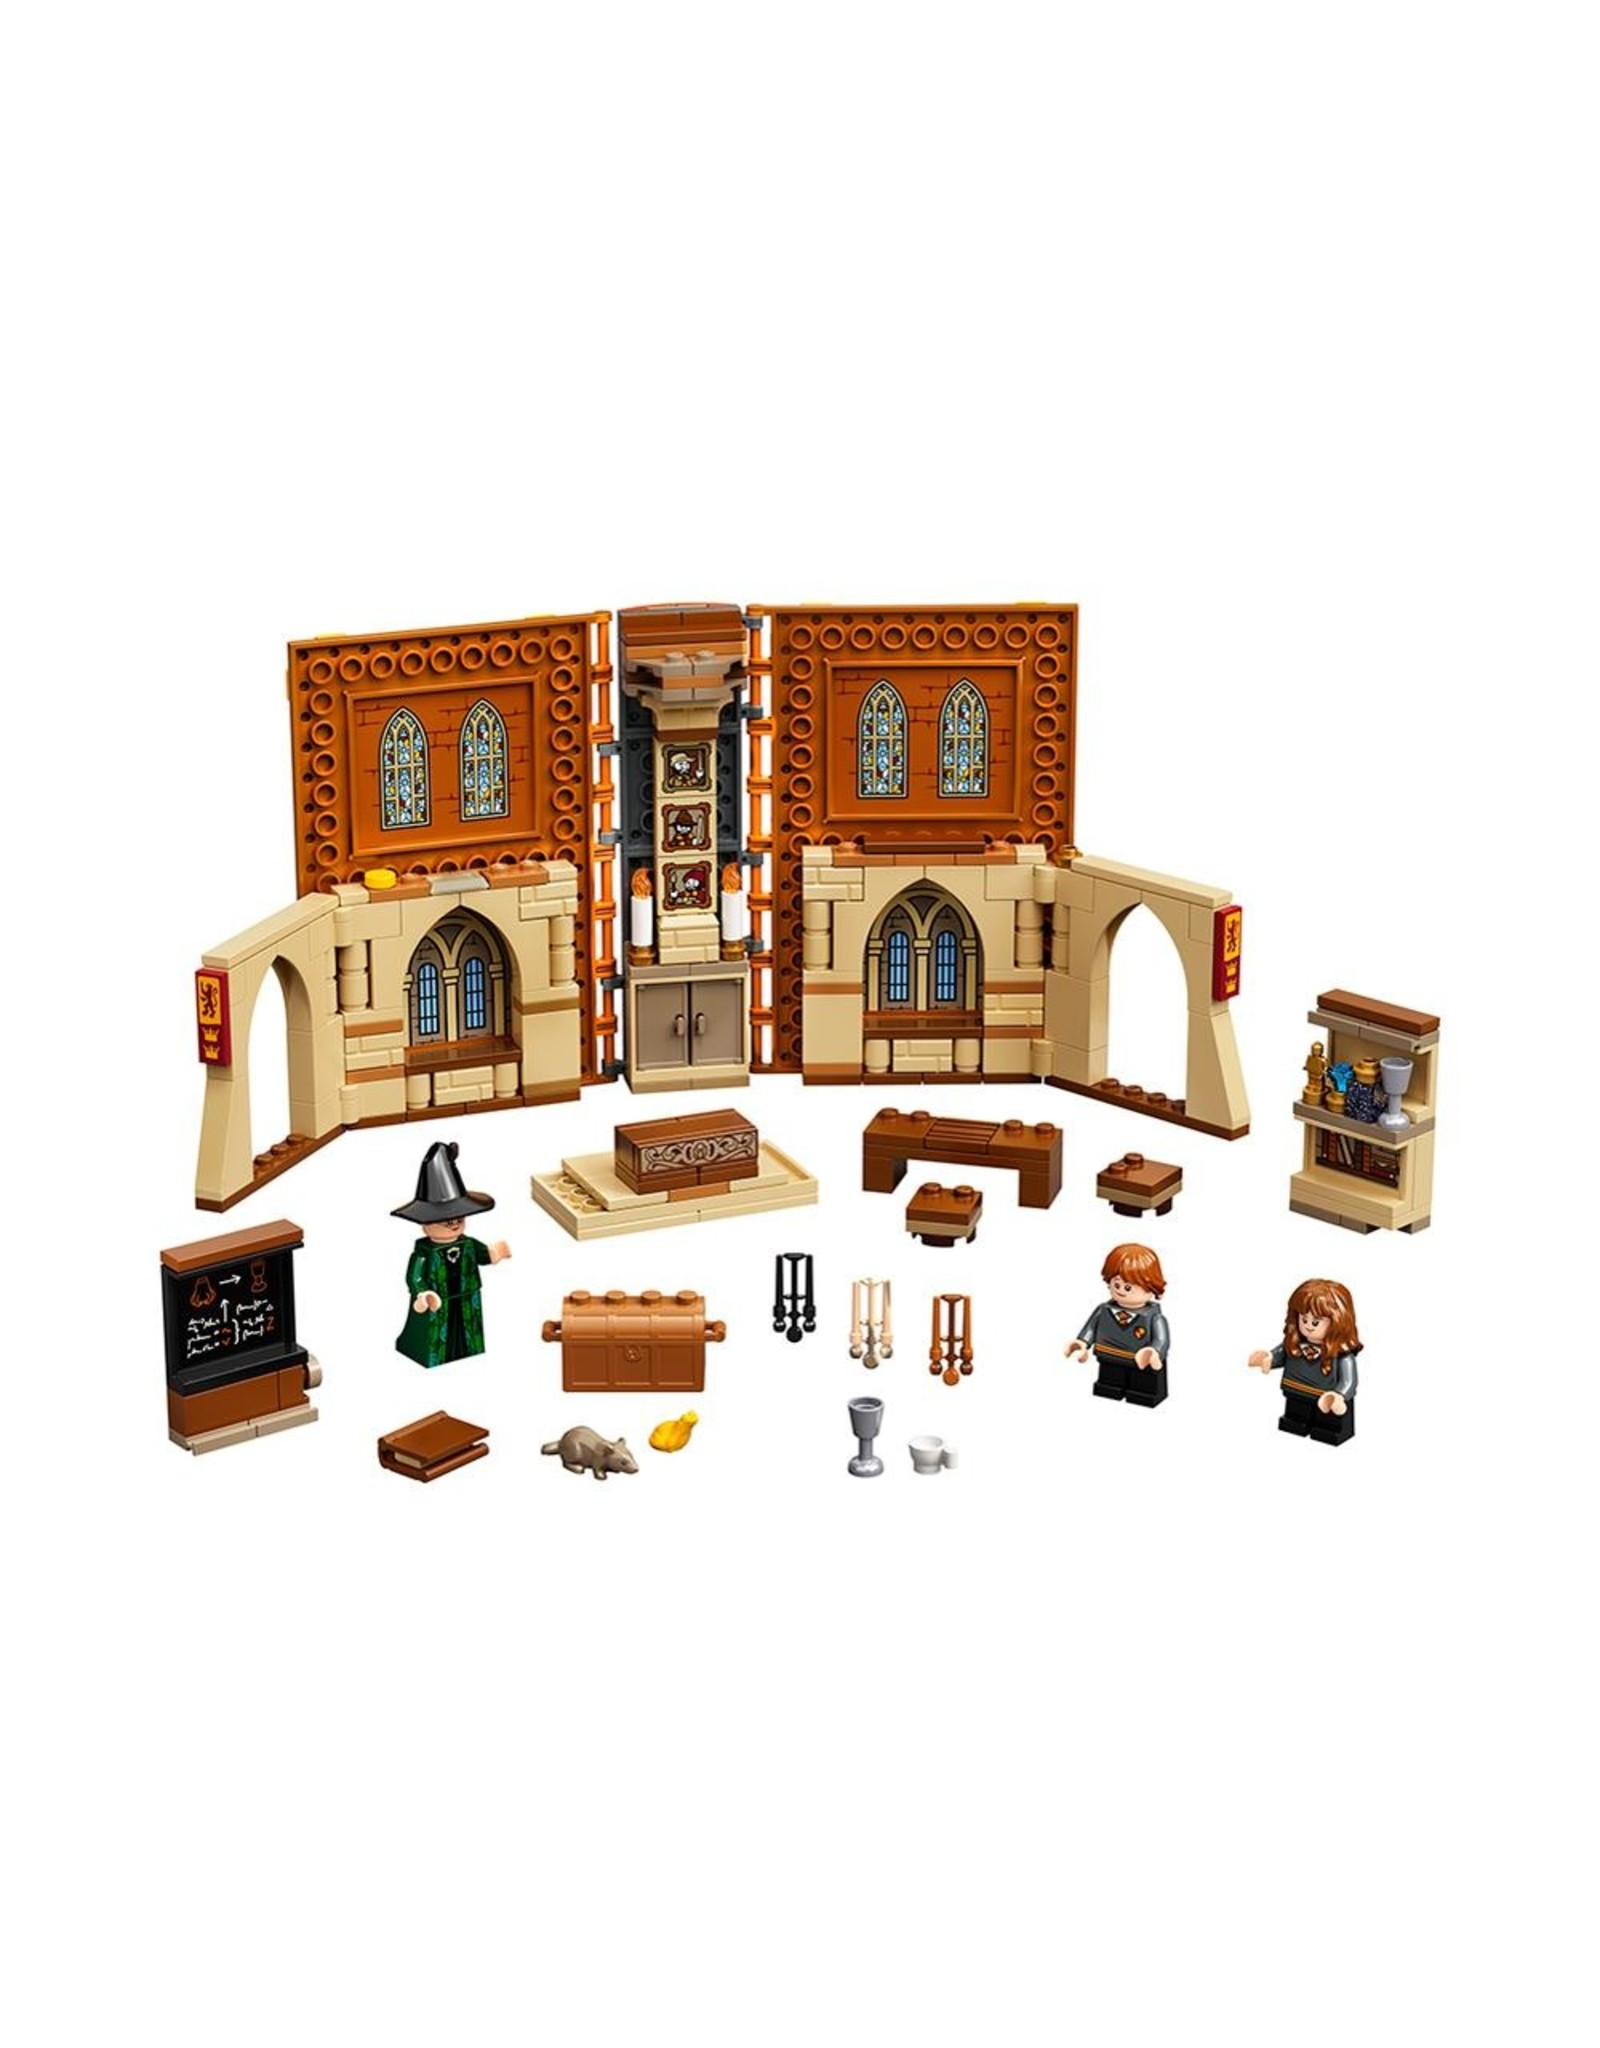 LEGO Harry Potter - 76382 Hogwarts Monent: Transfiguration Class